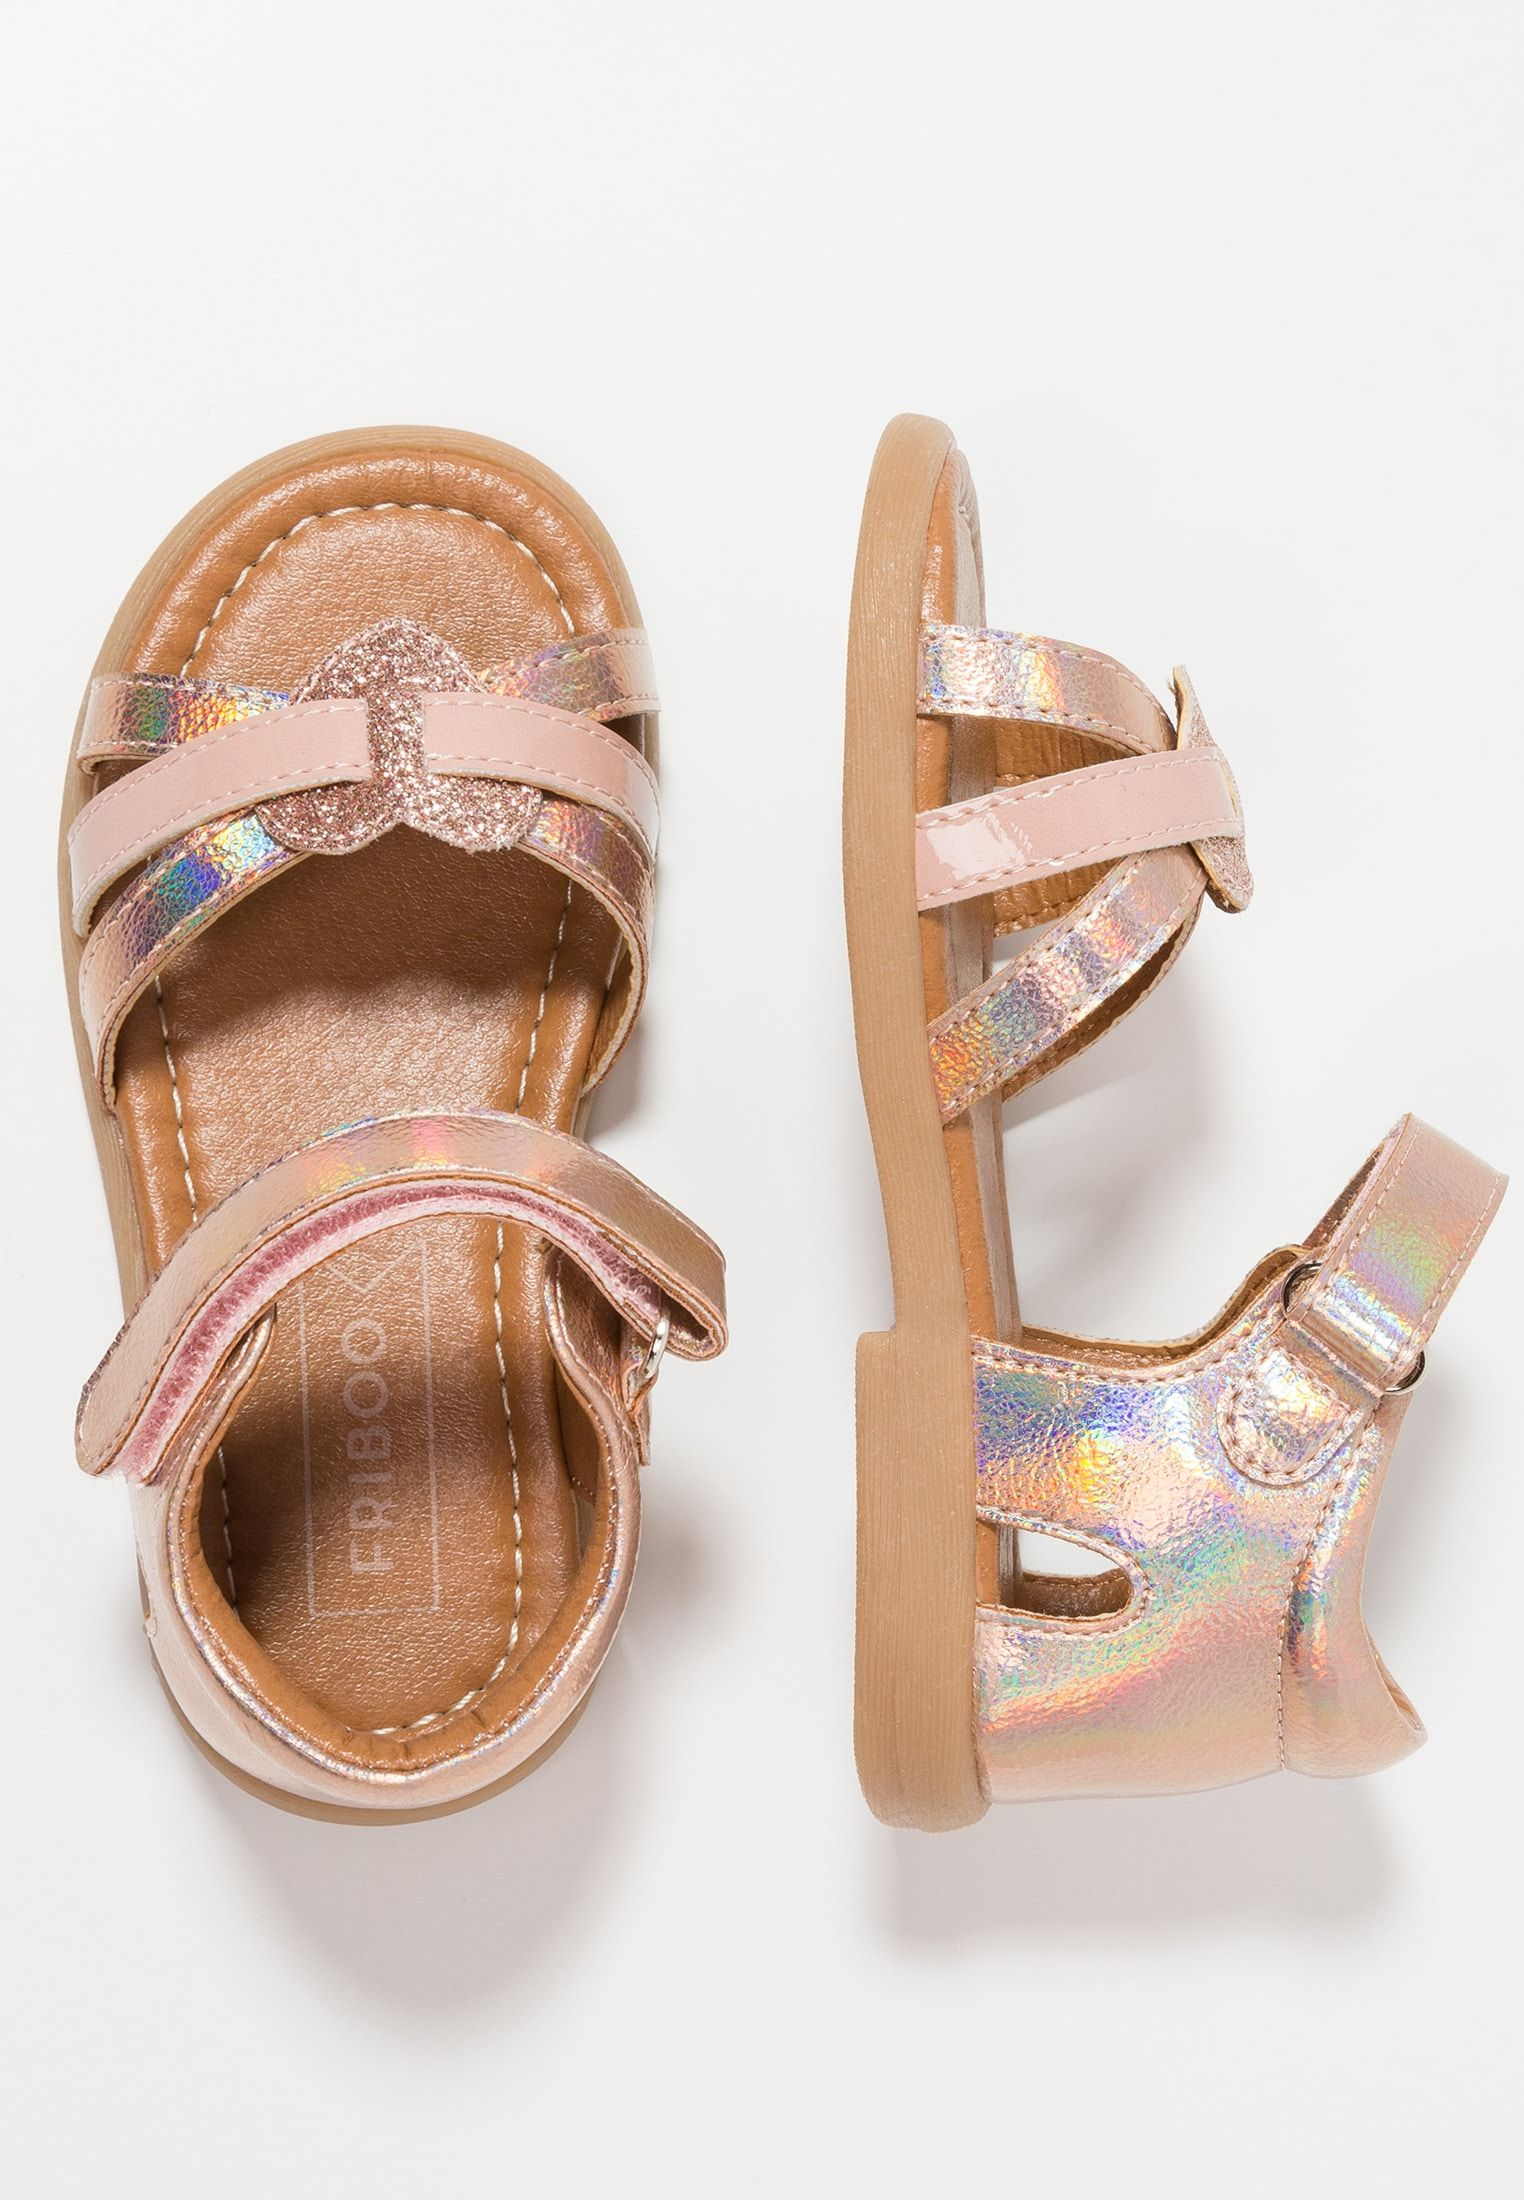 Friboo Sandals - rose gold - Zalando.co